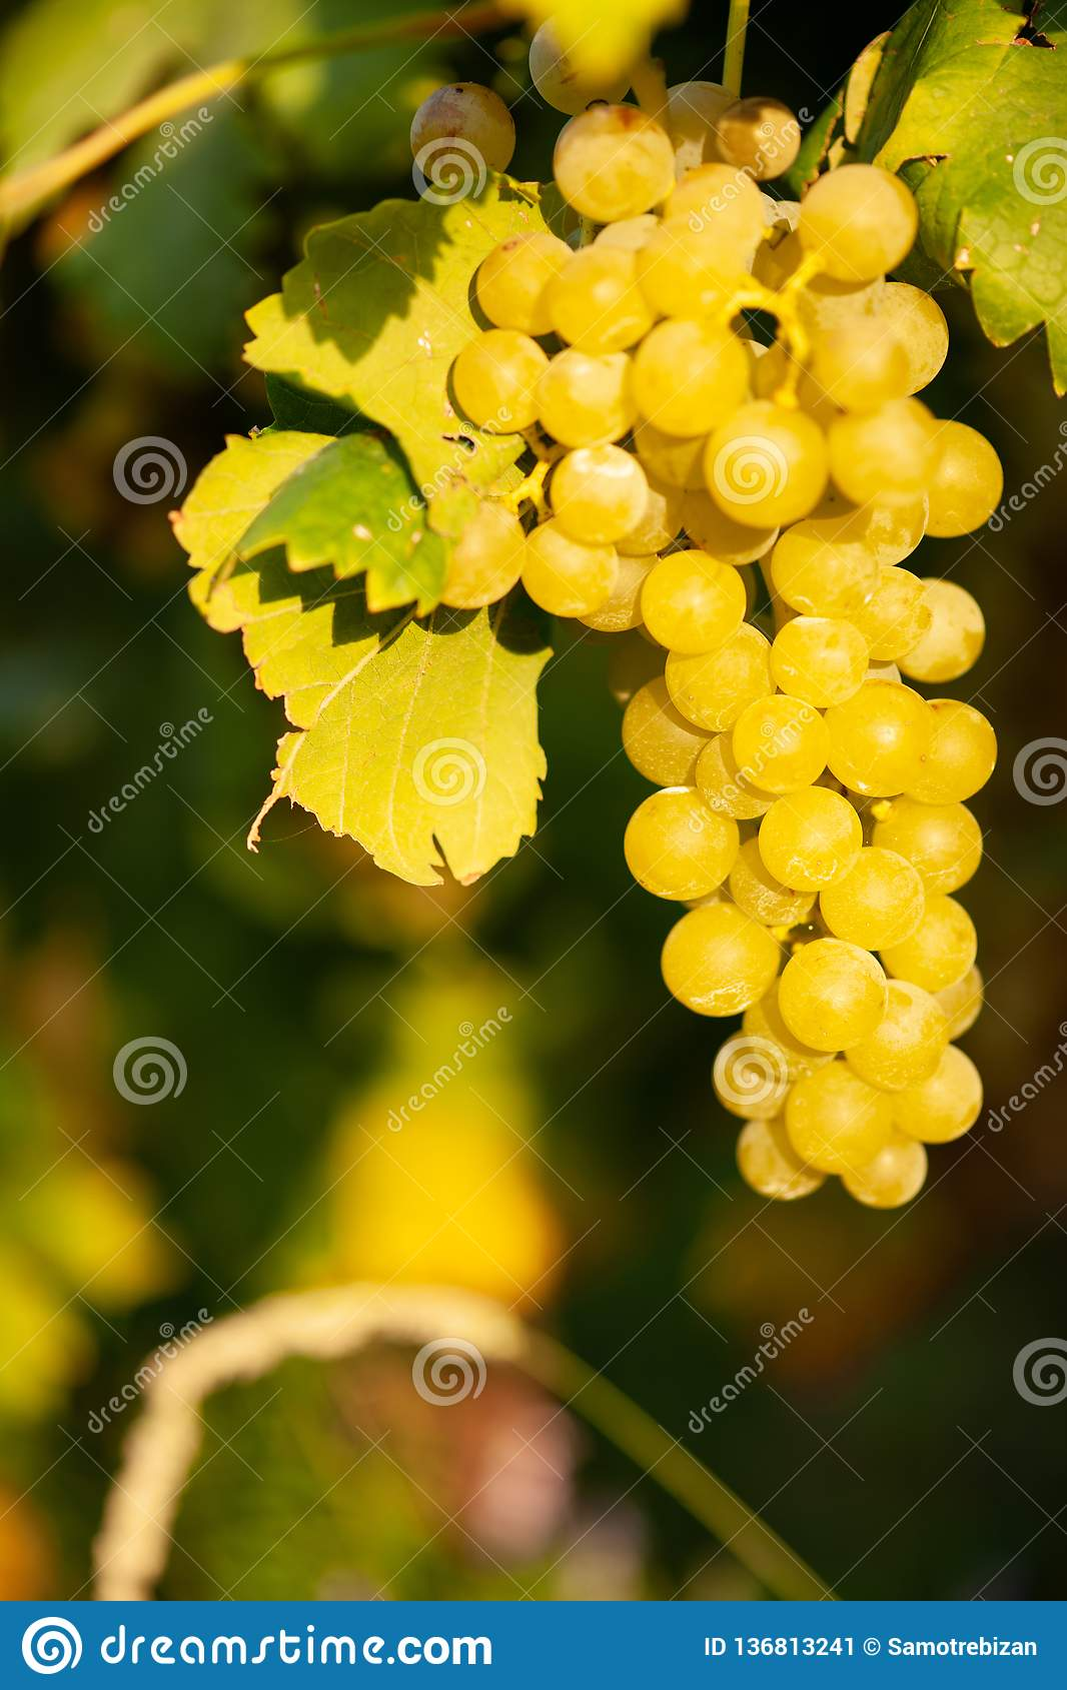 Rijpe witte druivenn wijngaard in de herfst vlak vóór oogst